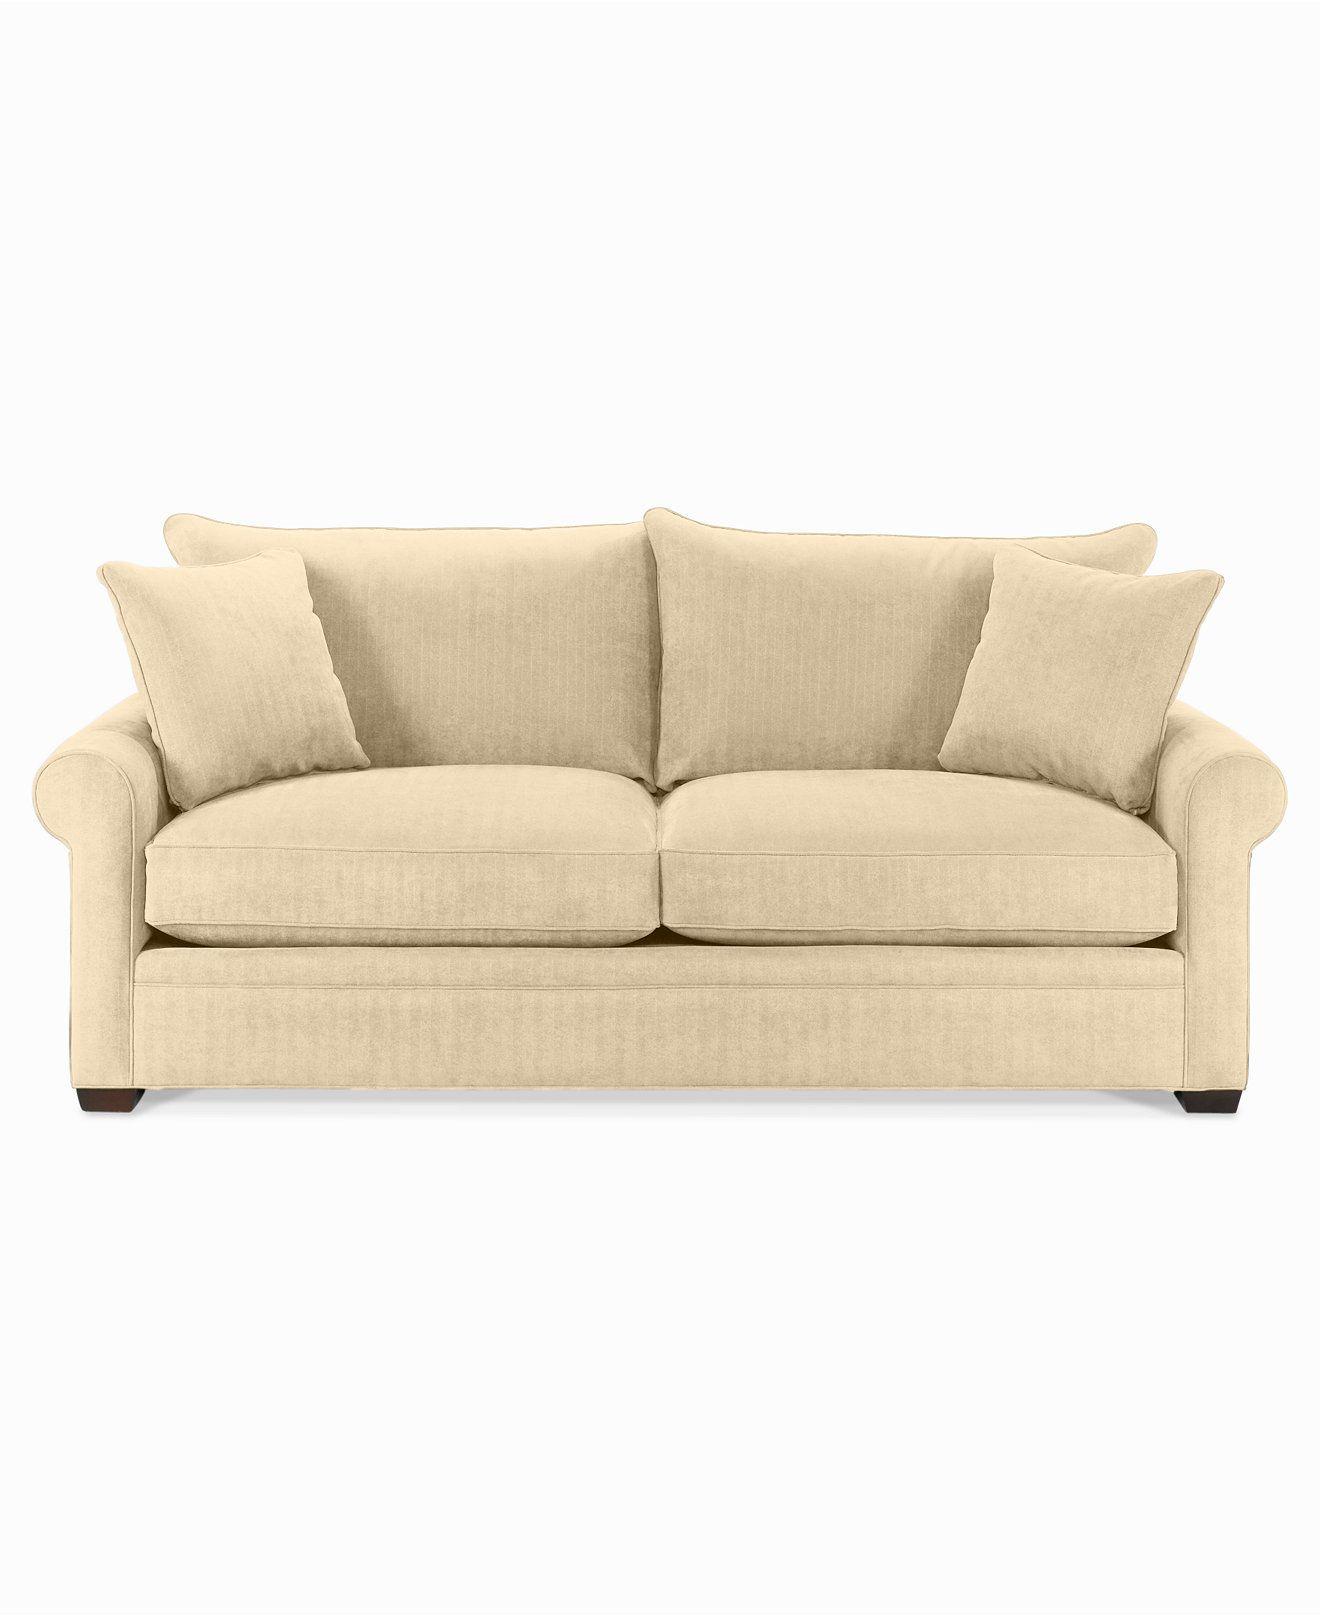 galileo cream microfiber queen sleeper sofa thomasville reclining gradschoolfairs